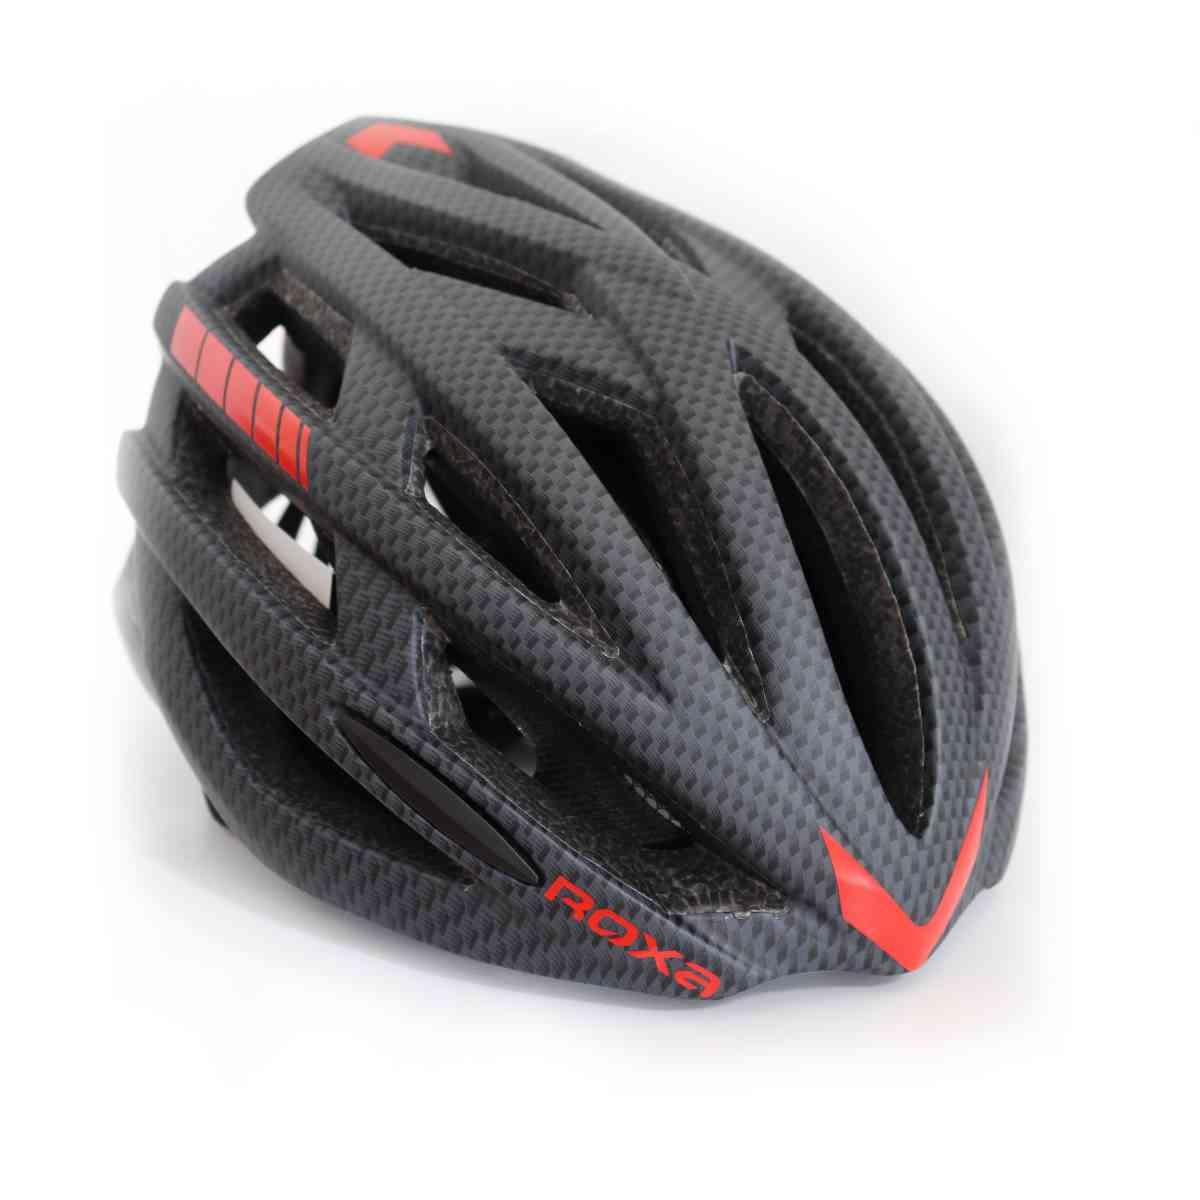 casco pattini regolabile 1 - roxa